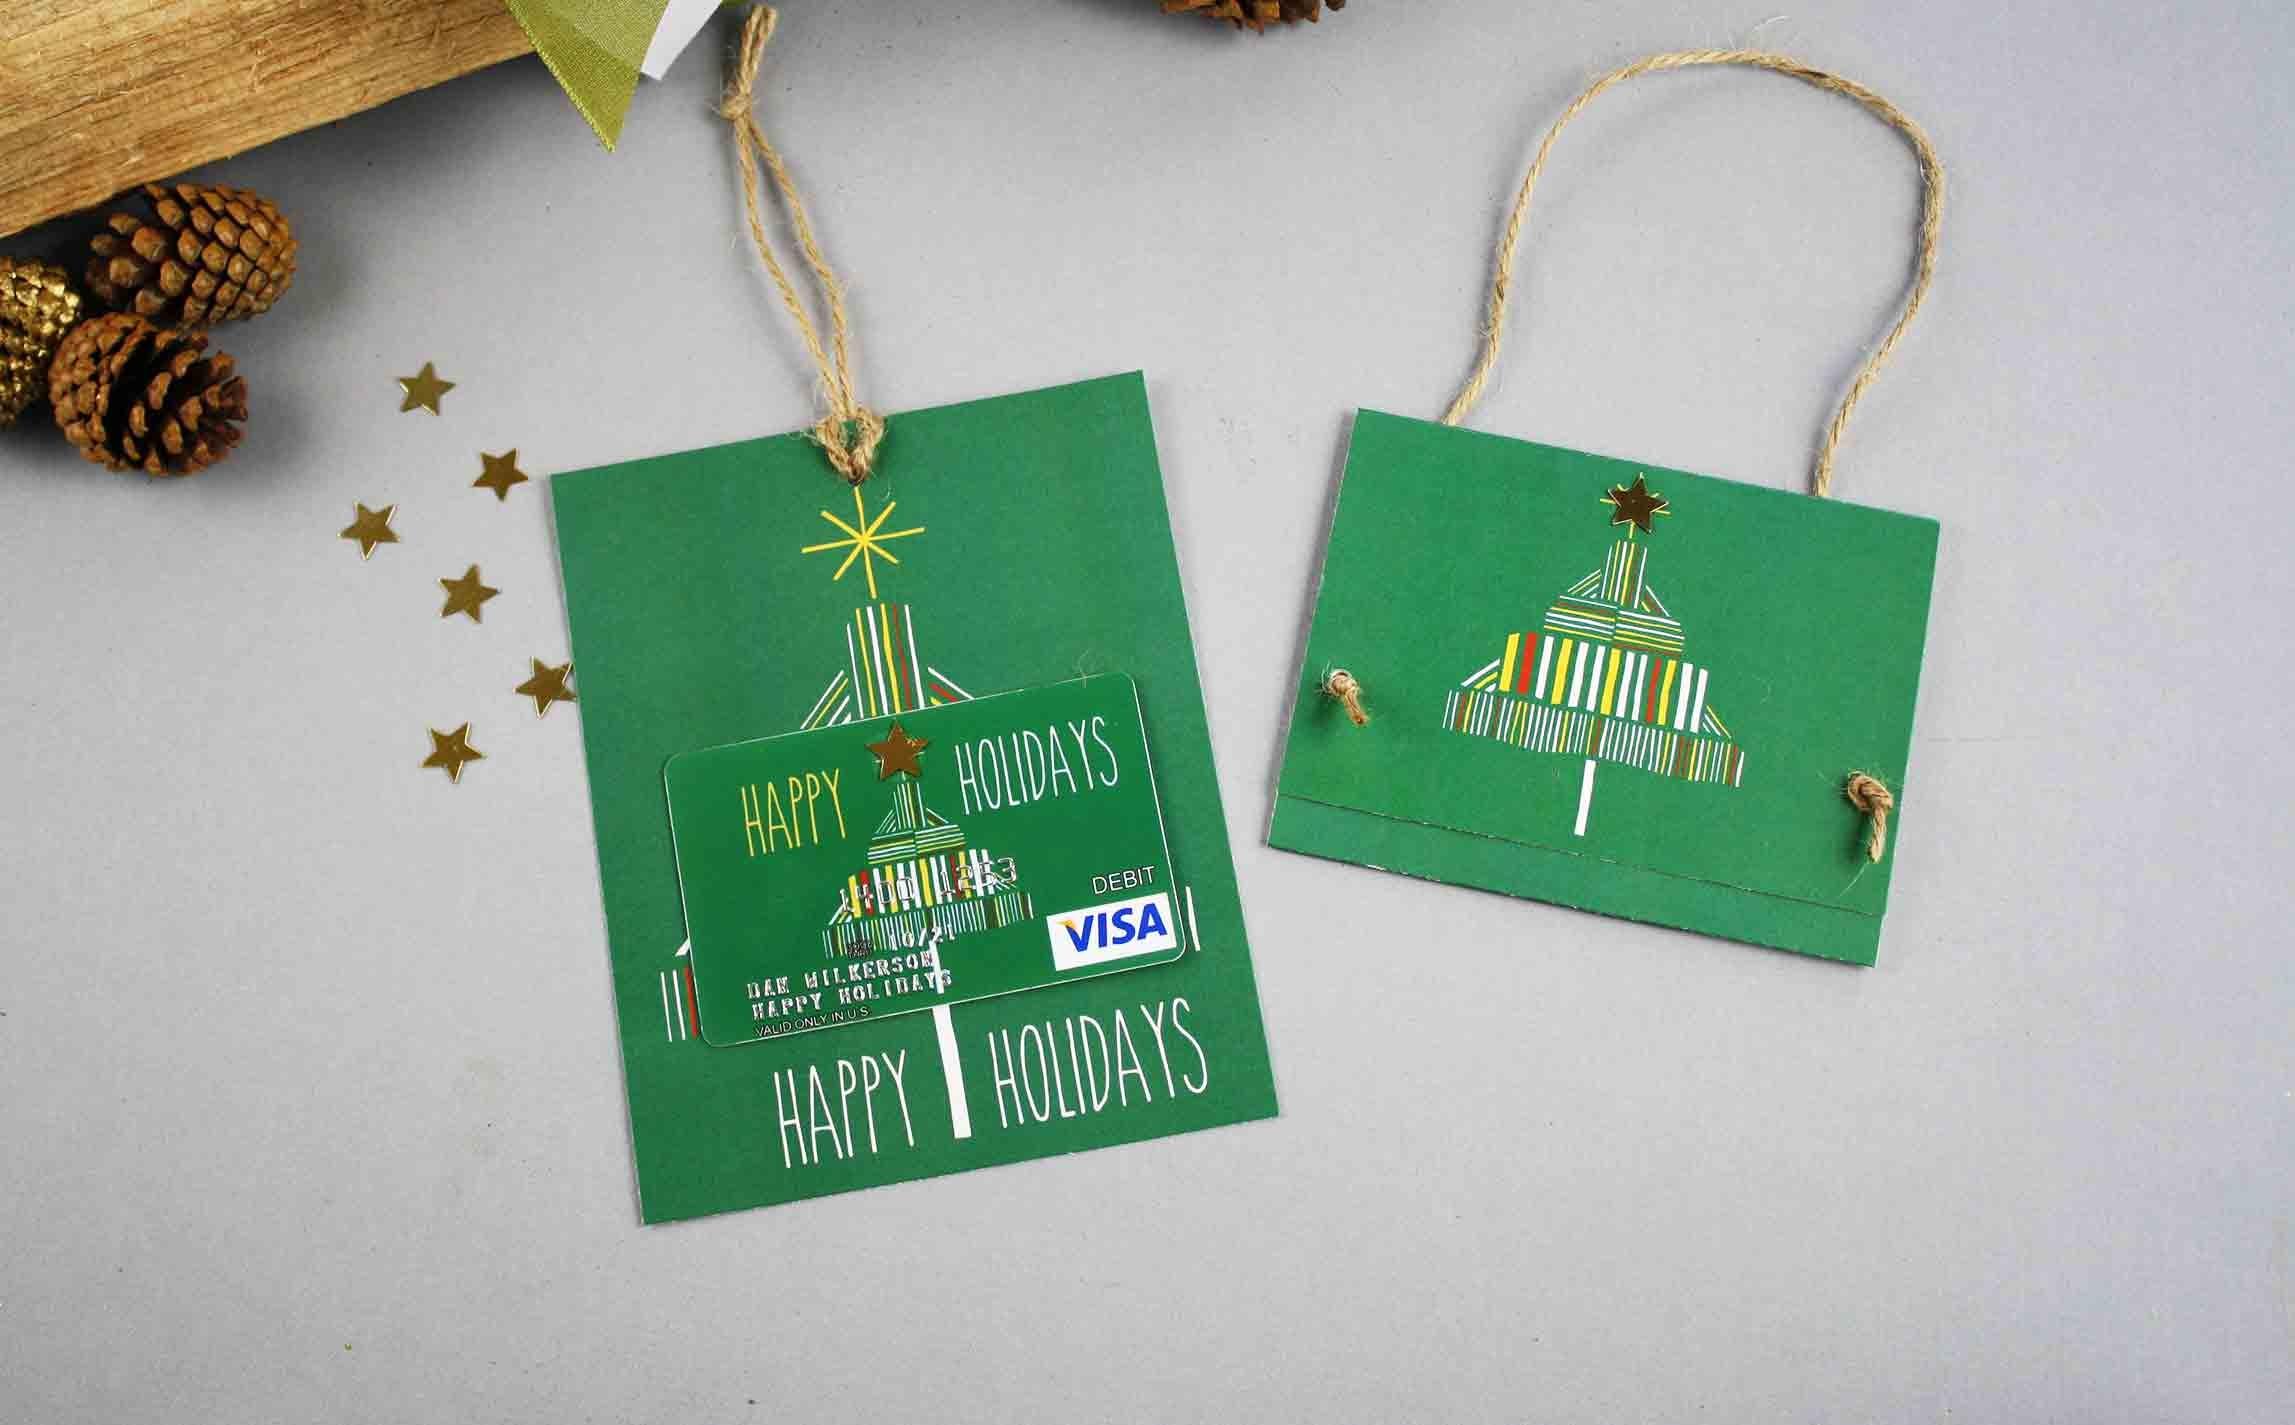 Free Gift Card Printable: Happy Holidays   Gcg - Make A Holiday Card For Free Printable